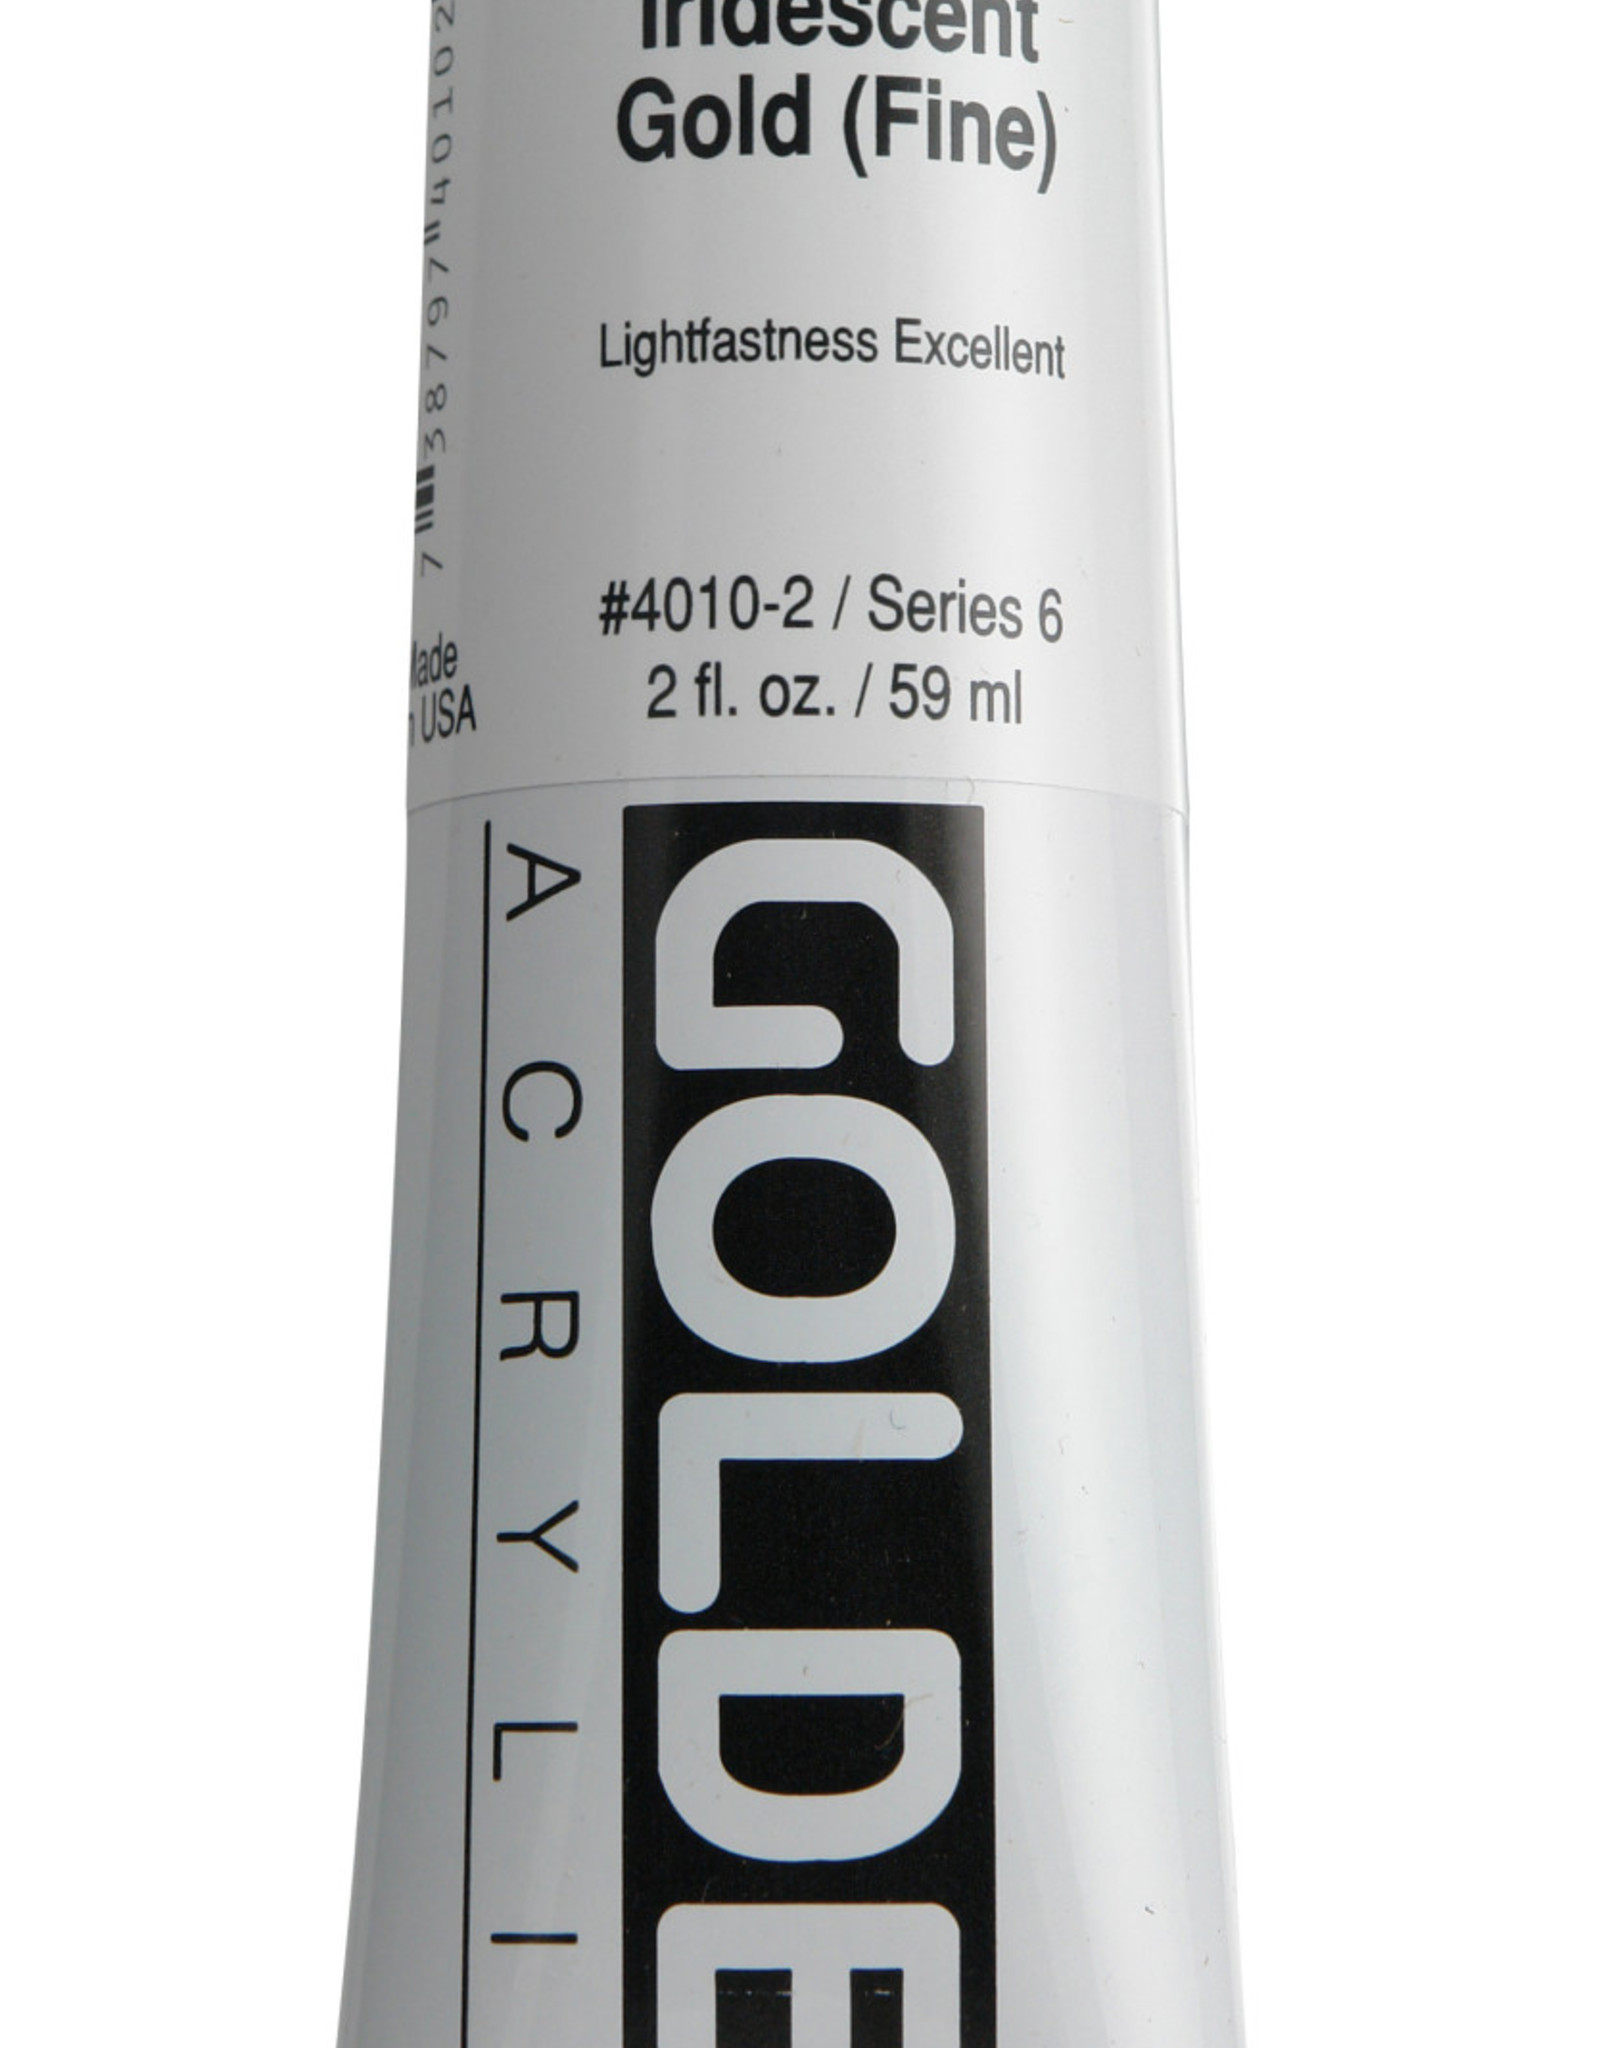 Golden, Heavy Body Acrylic Paint, Iridescent Gold Fine, Series 6, Tube, 2fl.oz.